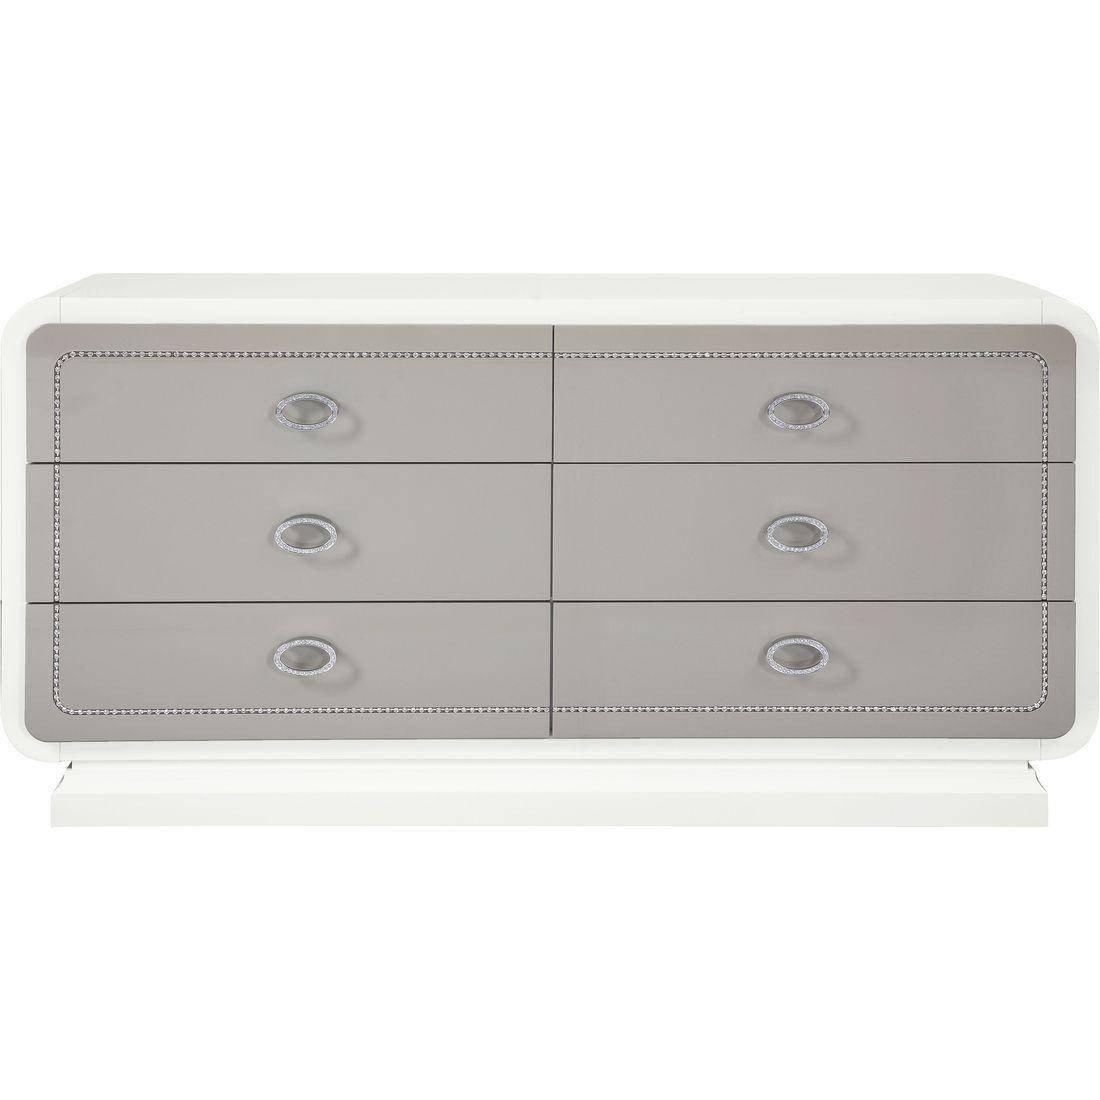 White Gloss Bedroom Furniture Inspirational Glam Ivory & Latte High Gloss Queen Bedroom Set 5pcs